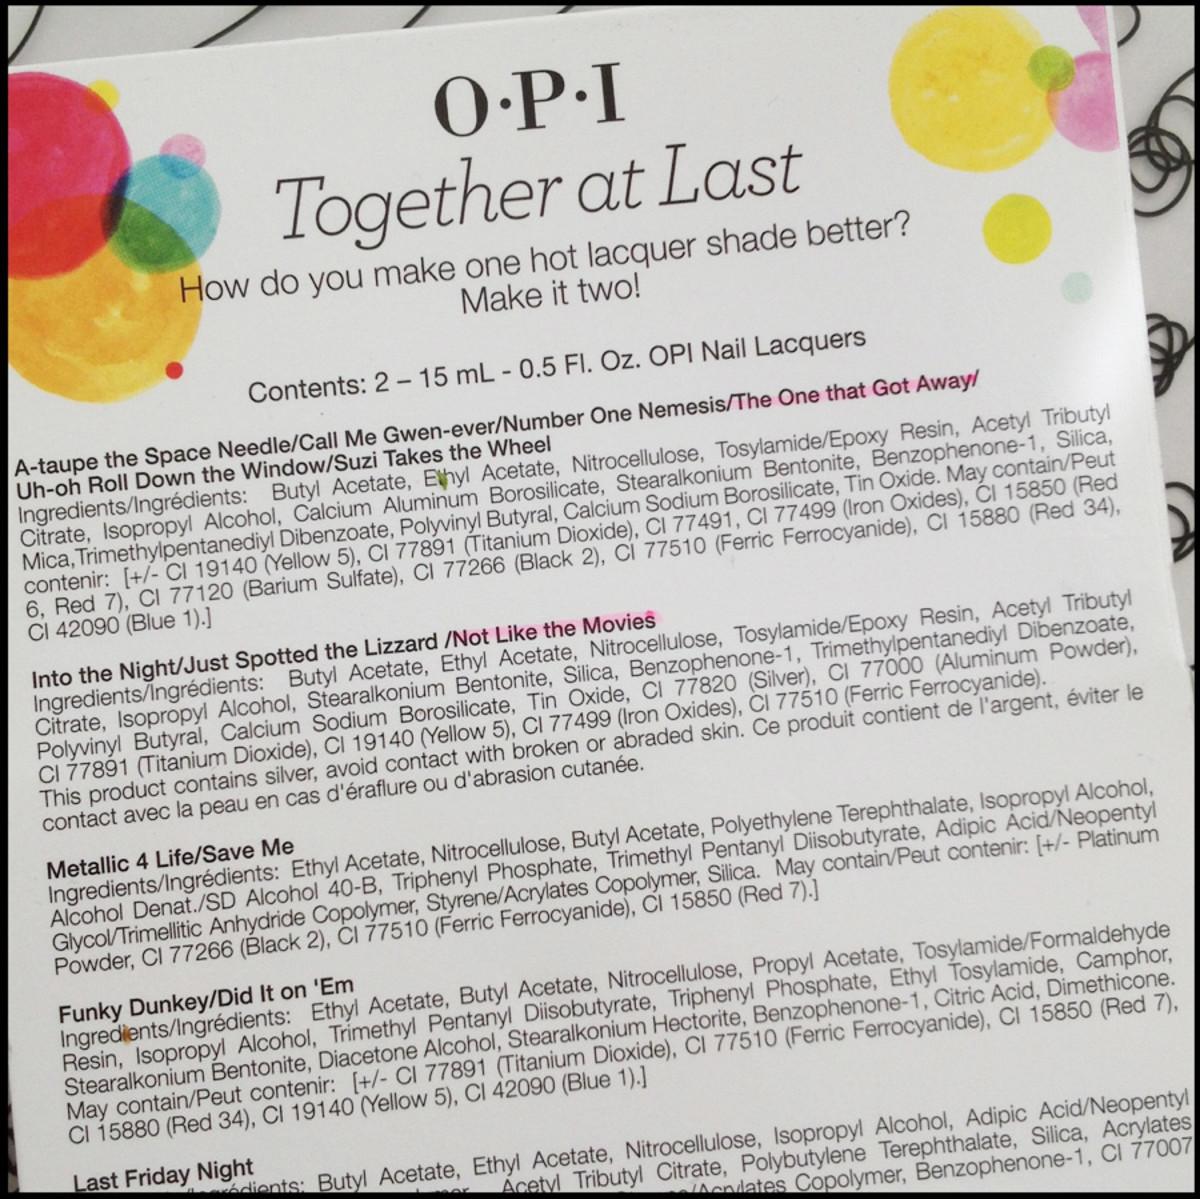 OPI Mystery Shades Beautygeeks